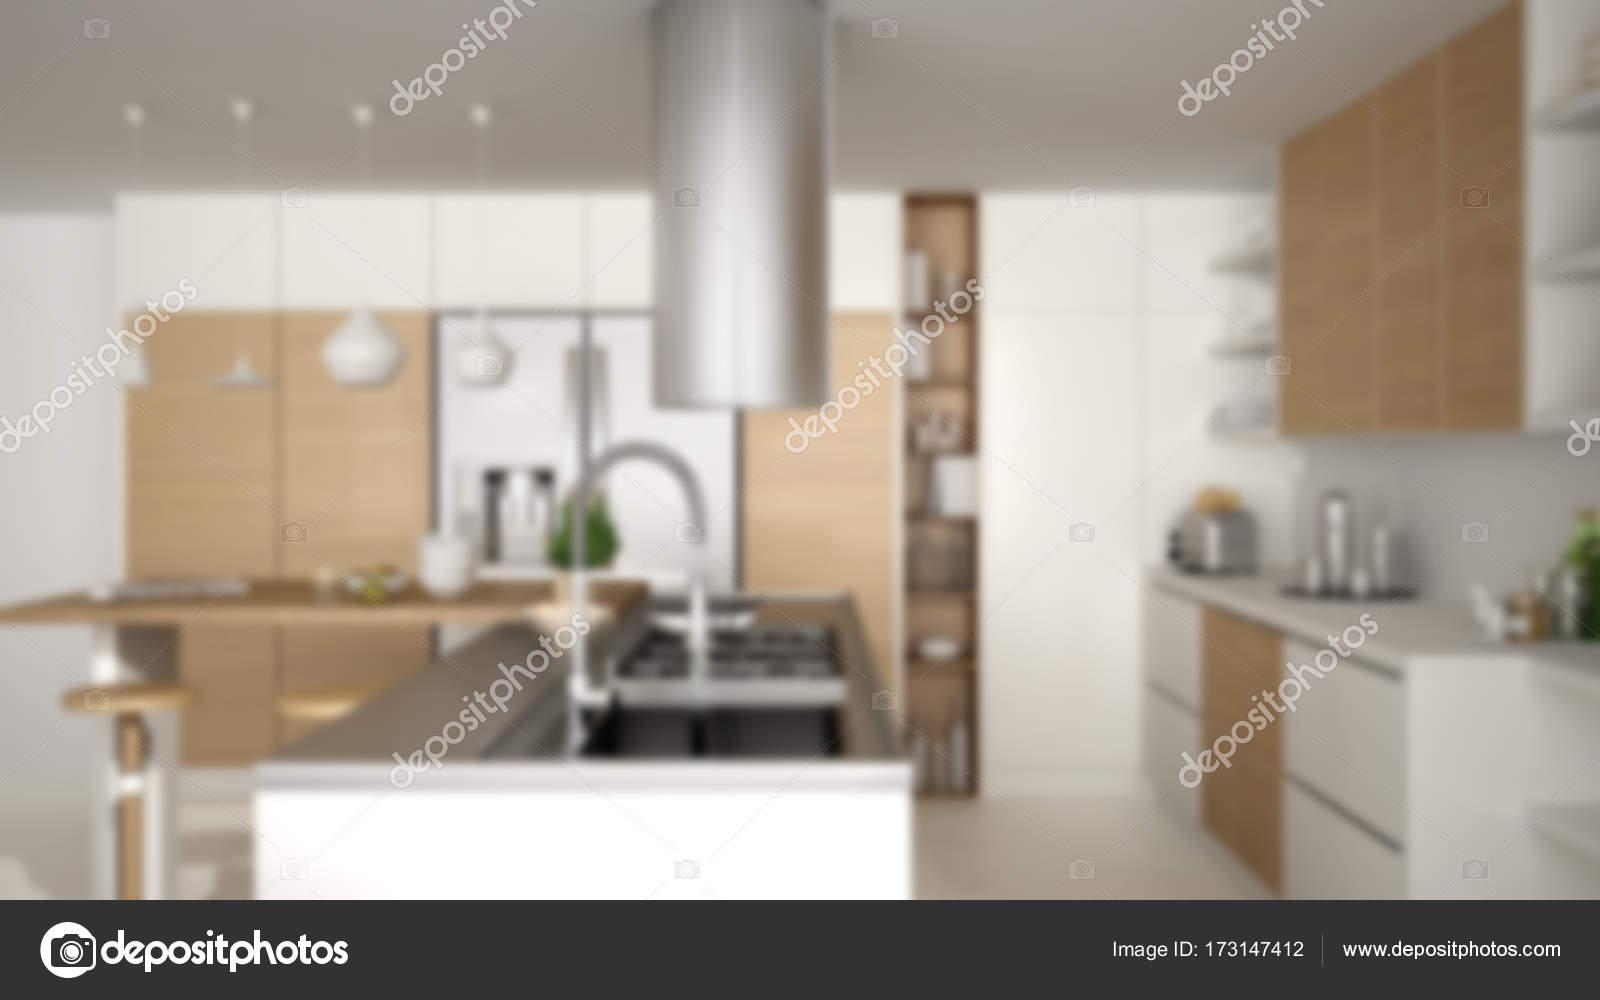 https://st3.depositphotos.com/1152281/17314/i/1600/depositphotos_173147412-stock-photo-blur-background-interior-design-modern.jpg